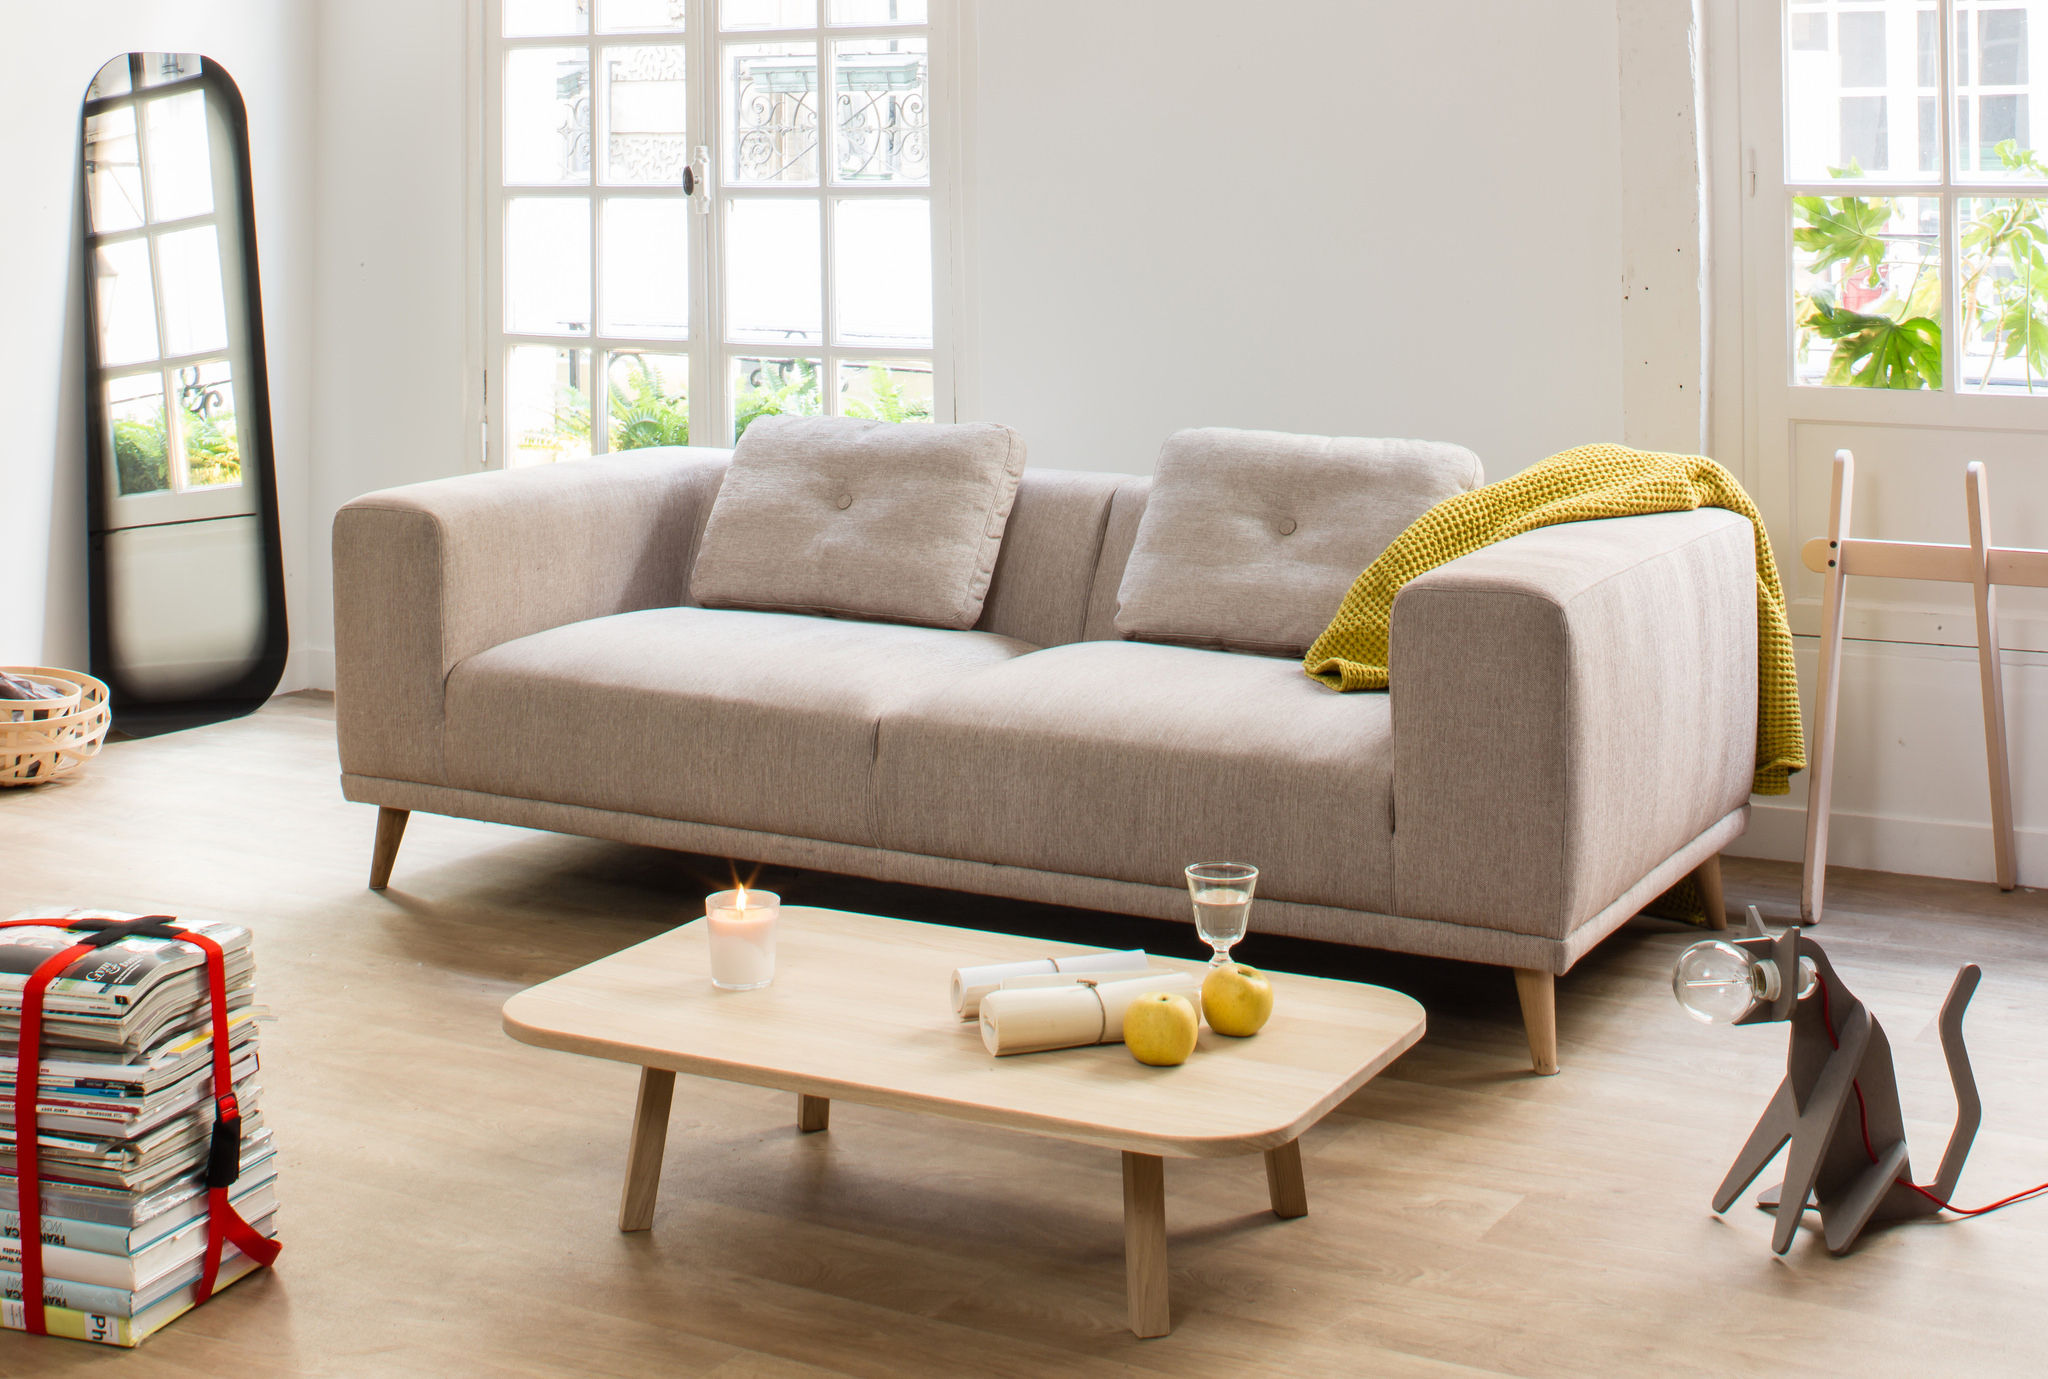 lampe de table get out chat jaune moutarde c ble gris enostudio. Black Bedroom Furniture Sets. Home Design Ideas